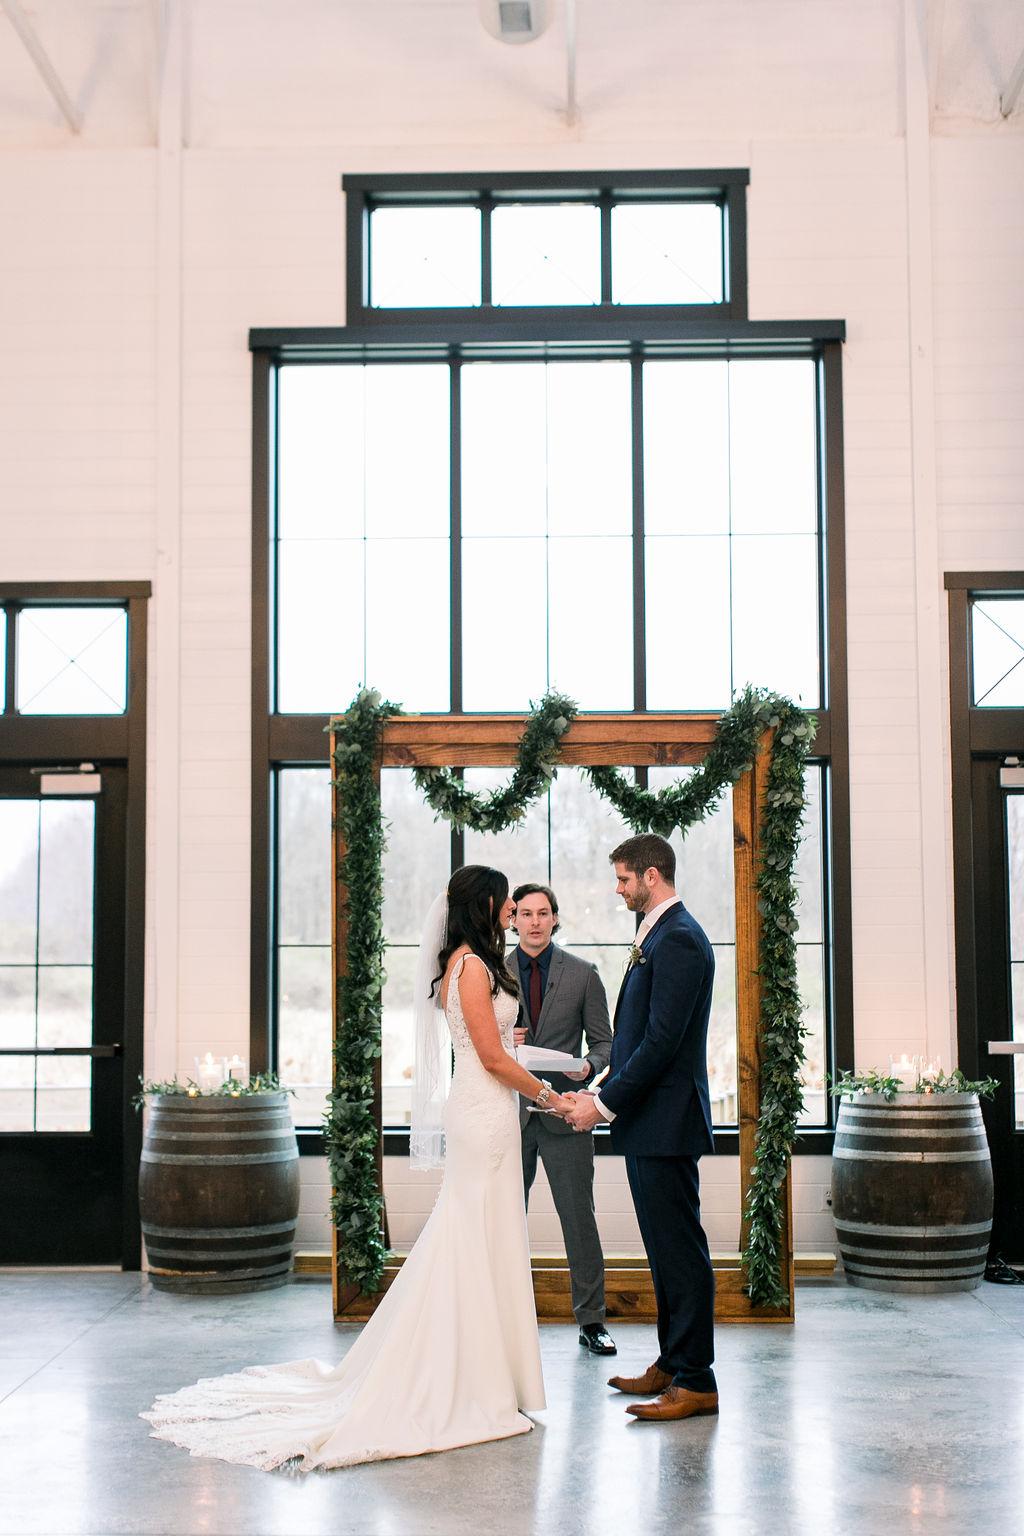 Indoor winter greenery nature-inspired wedding - 39.jpg